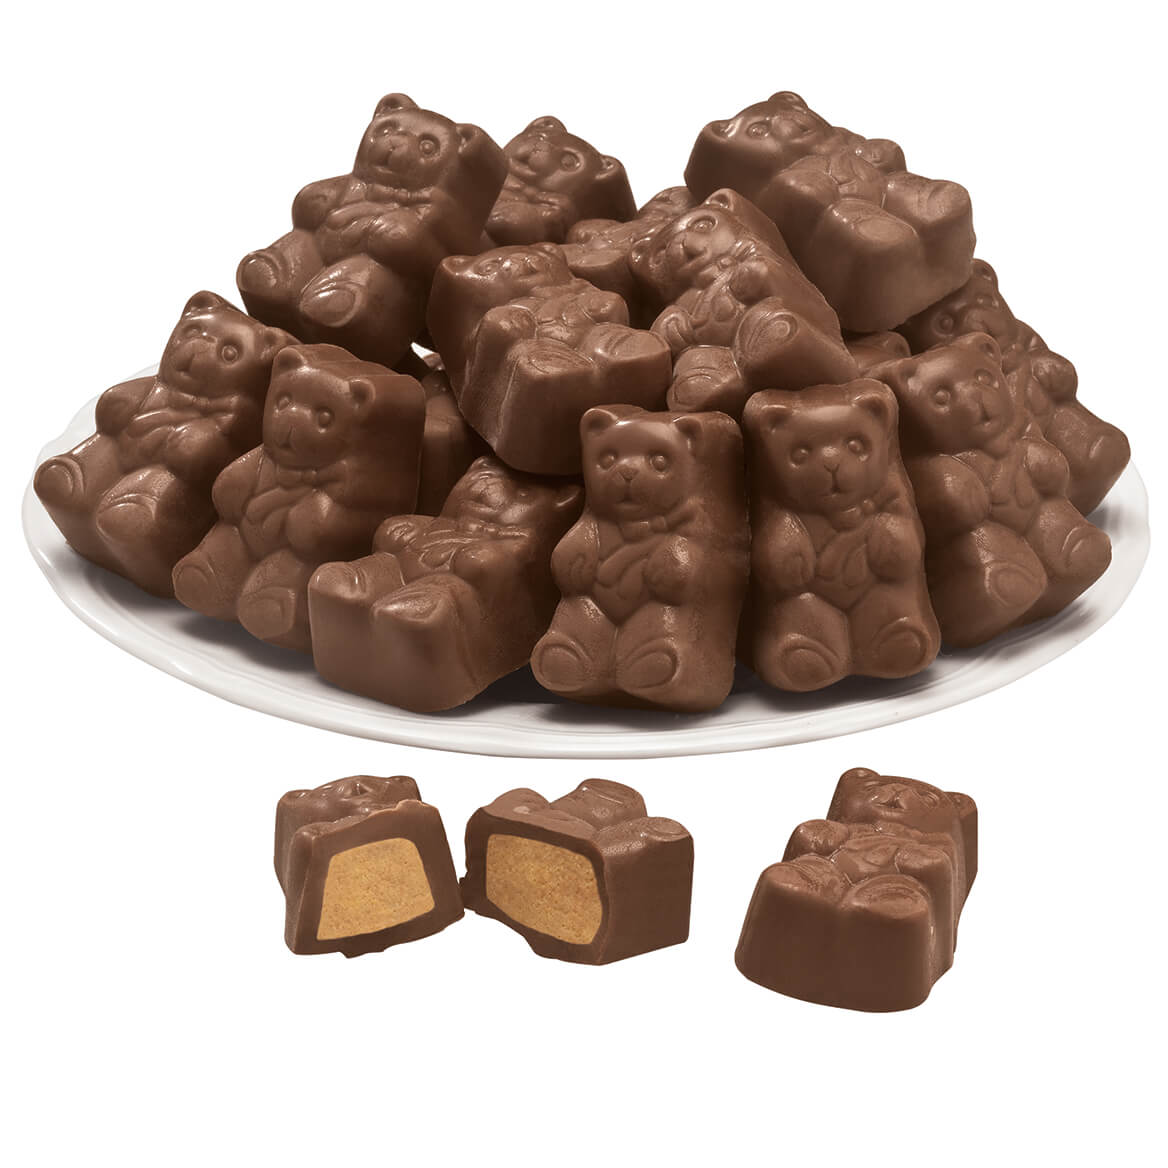 Milk Chocolate Peanut Butter Bears 6.5 oz.-352749